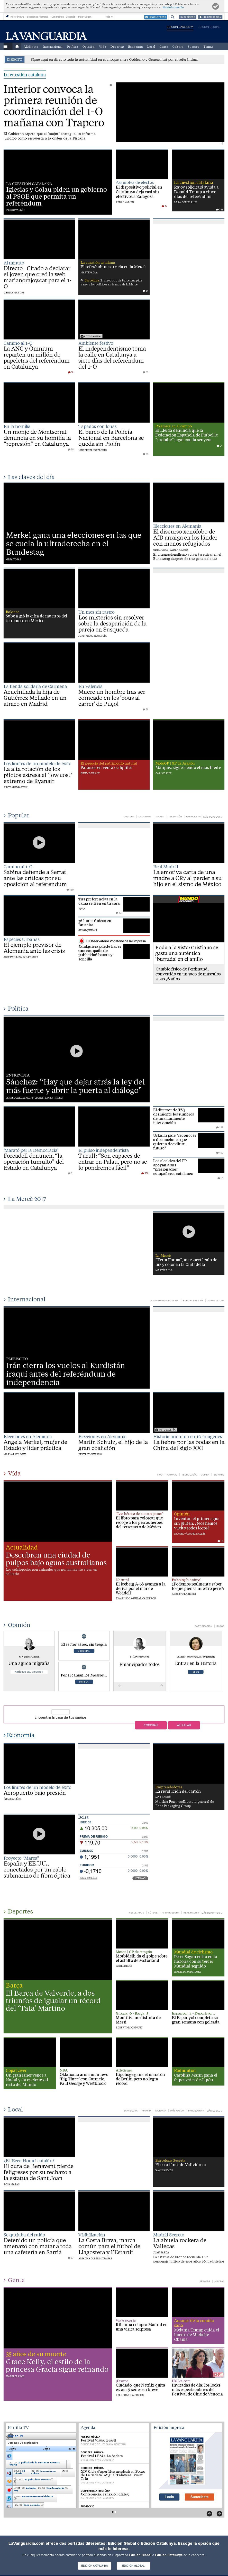 La Vanguardia at Sunday Sept. 24, 2017, 5:41 p.m. UTC